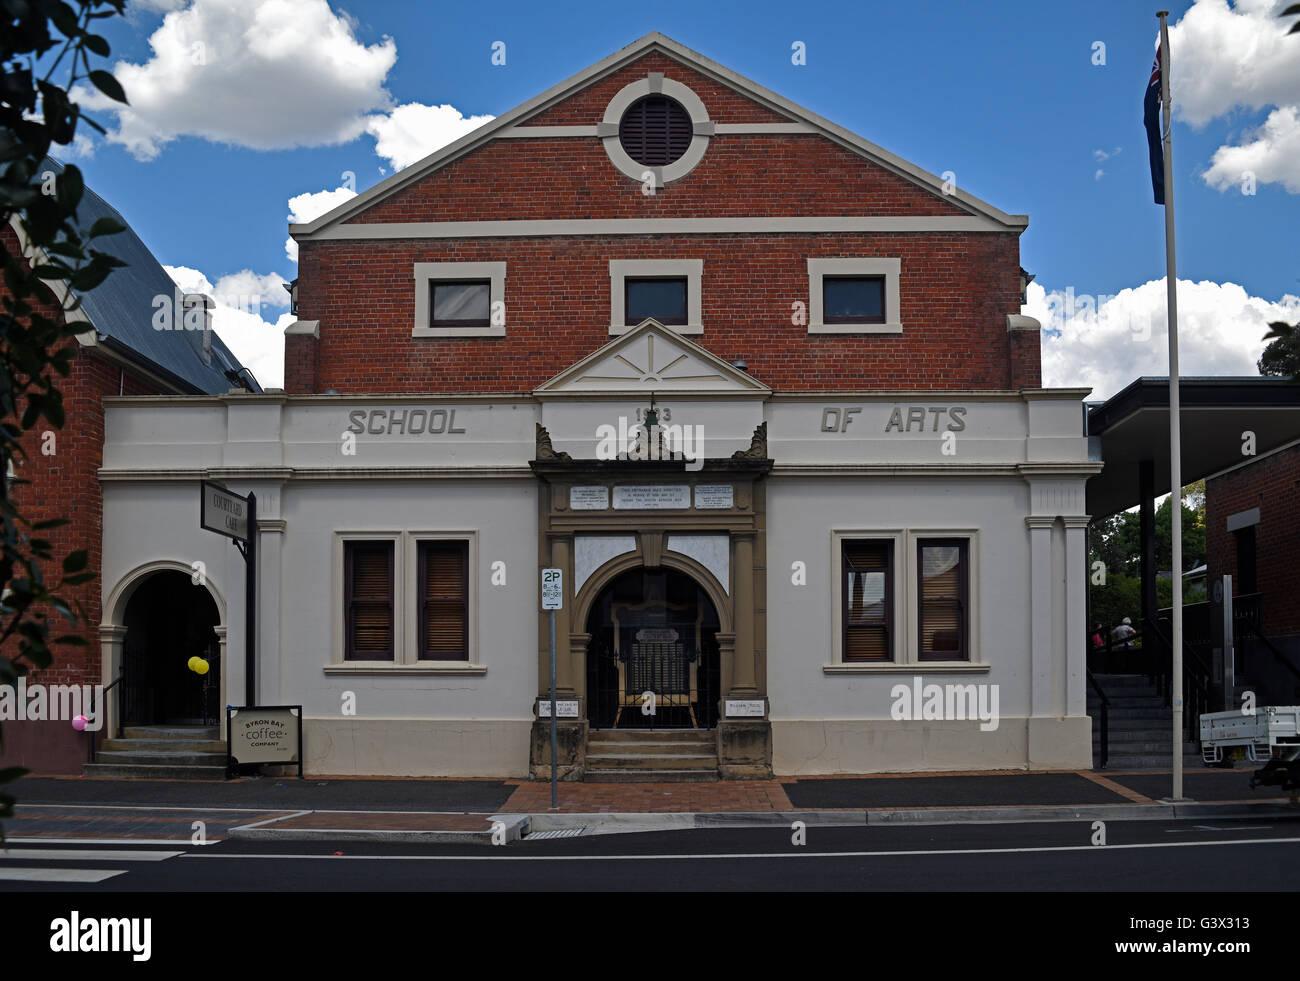 tenterfield school of arts historic building - Stock Image